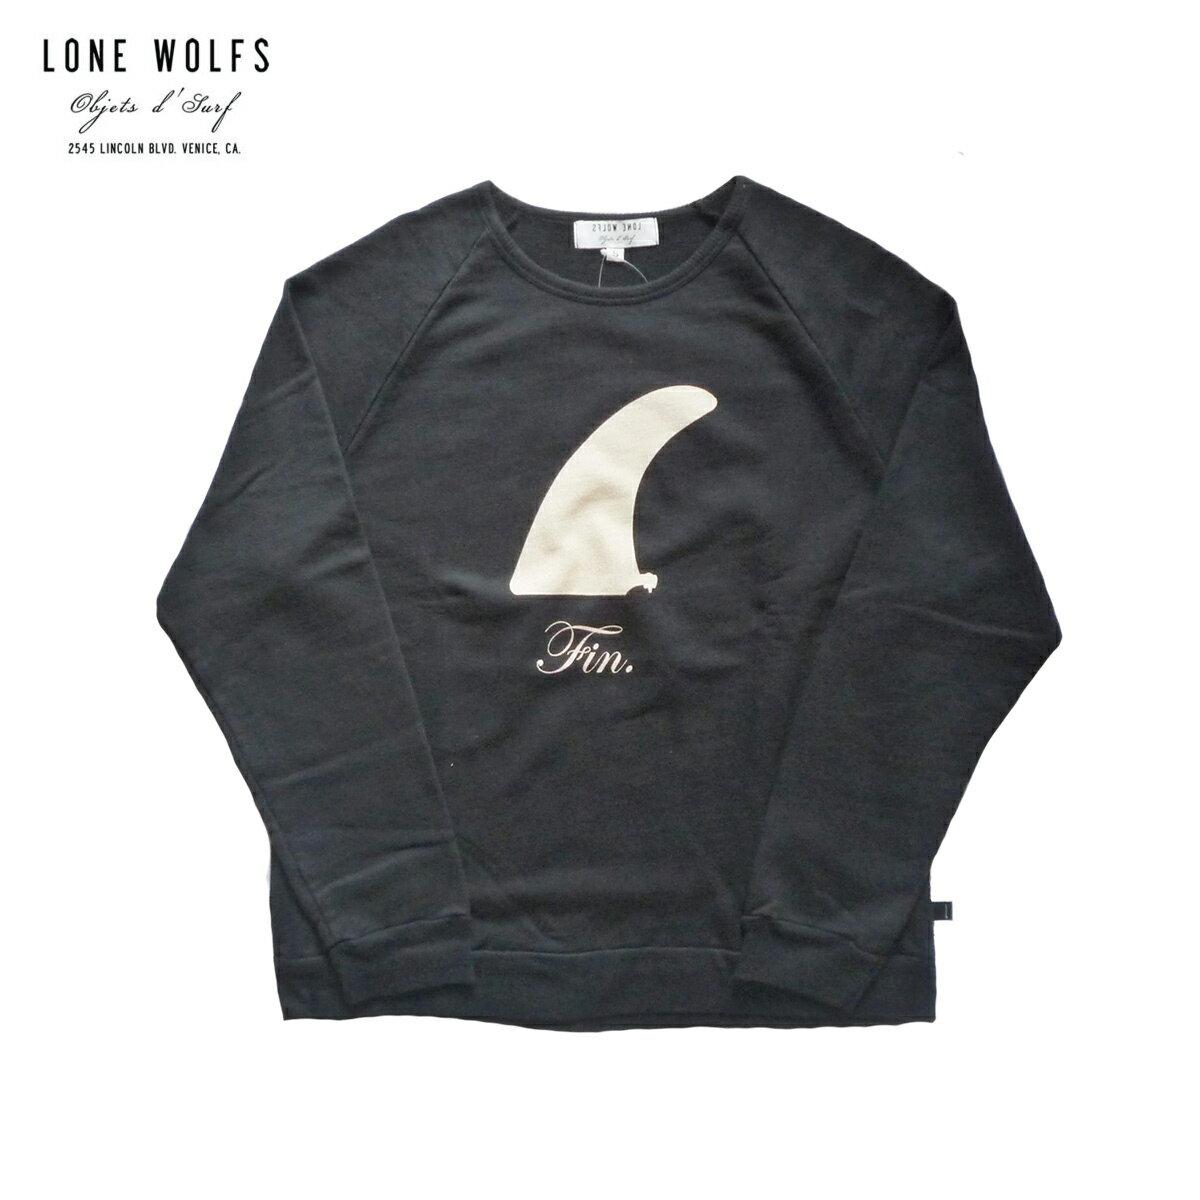 LONE WOLFS ローンウルフズ CREW SWEAT FIN